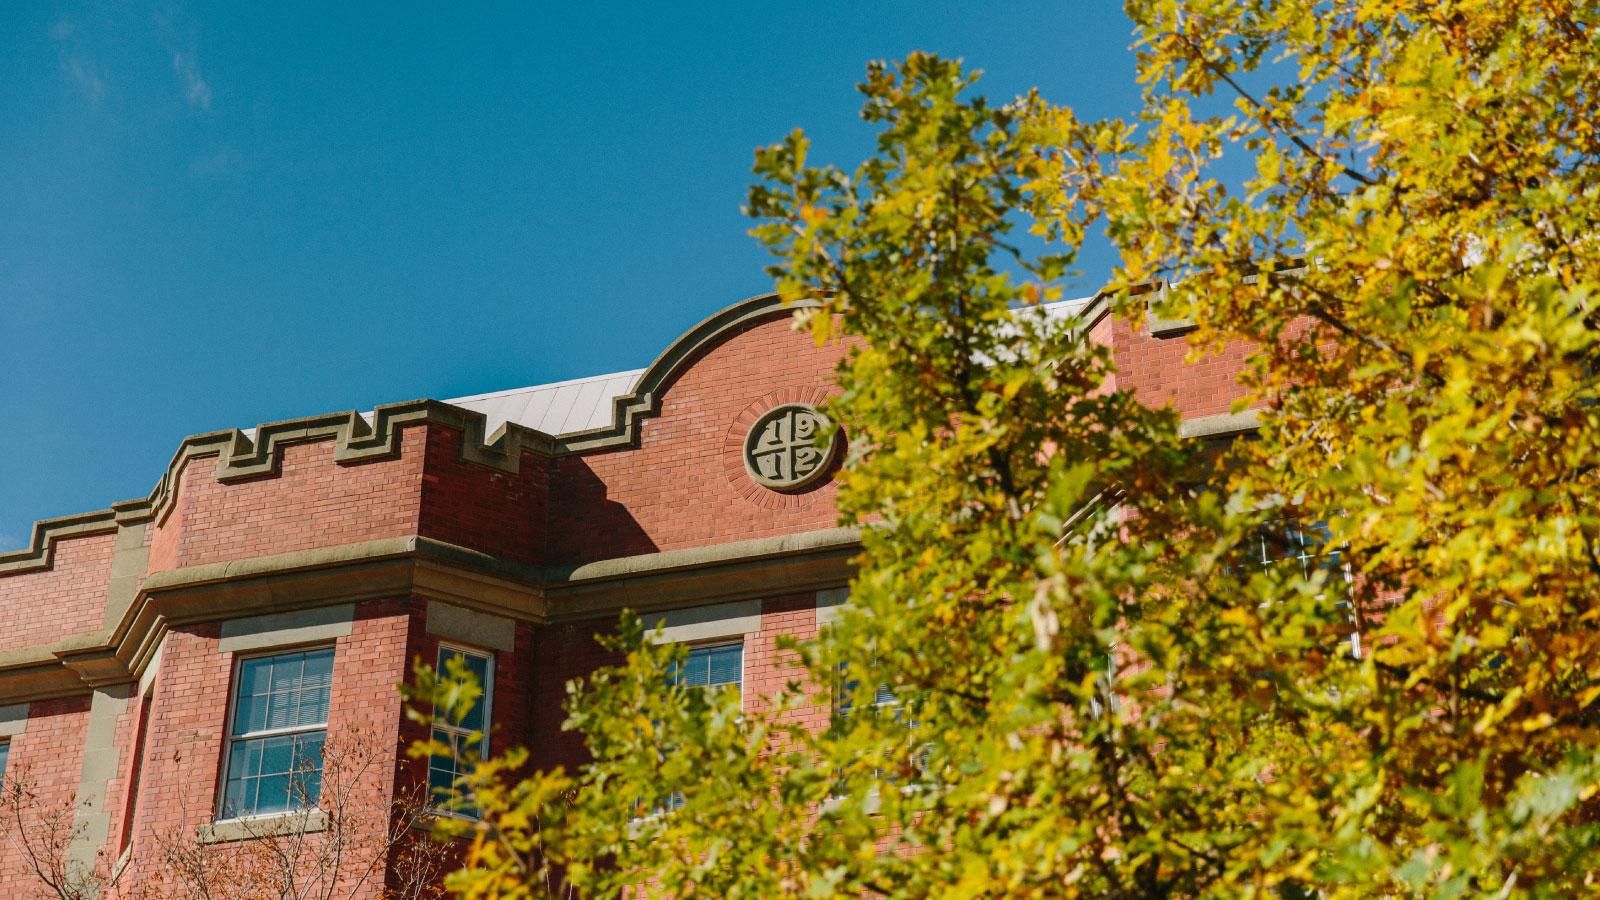 St Stephen's College University of Alberta